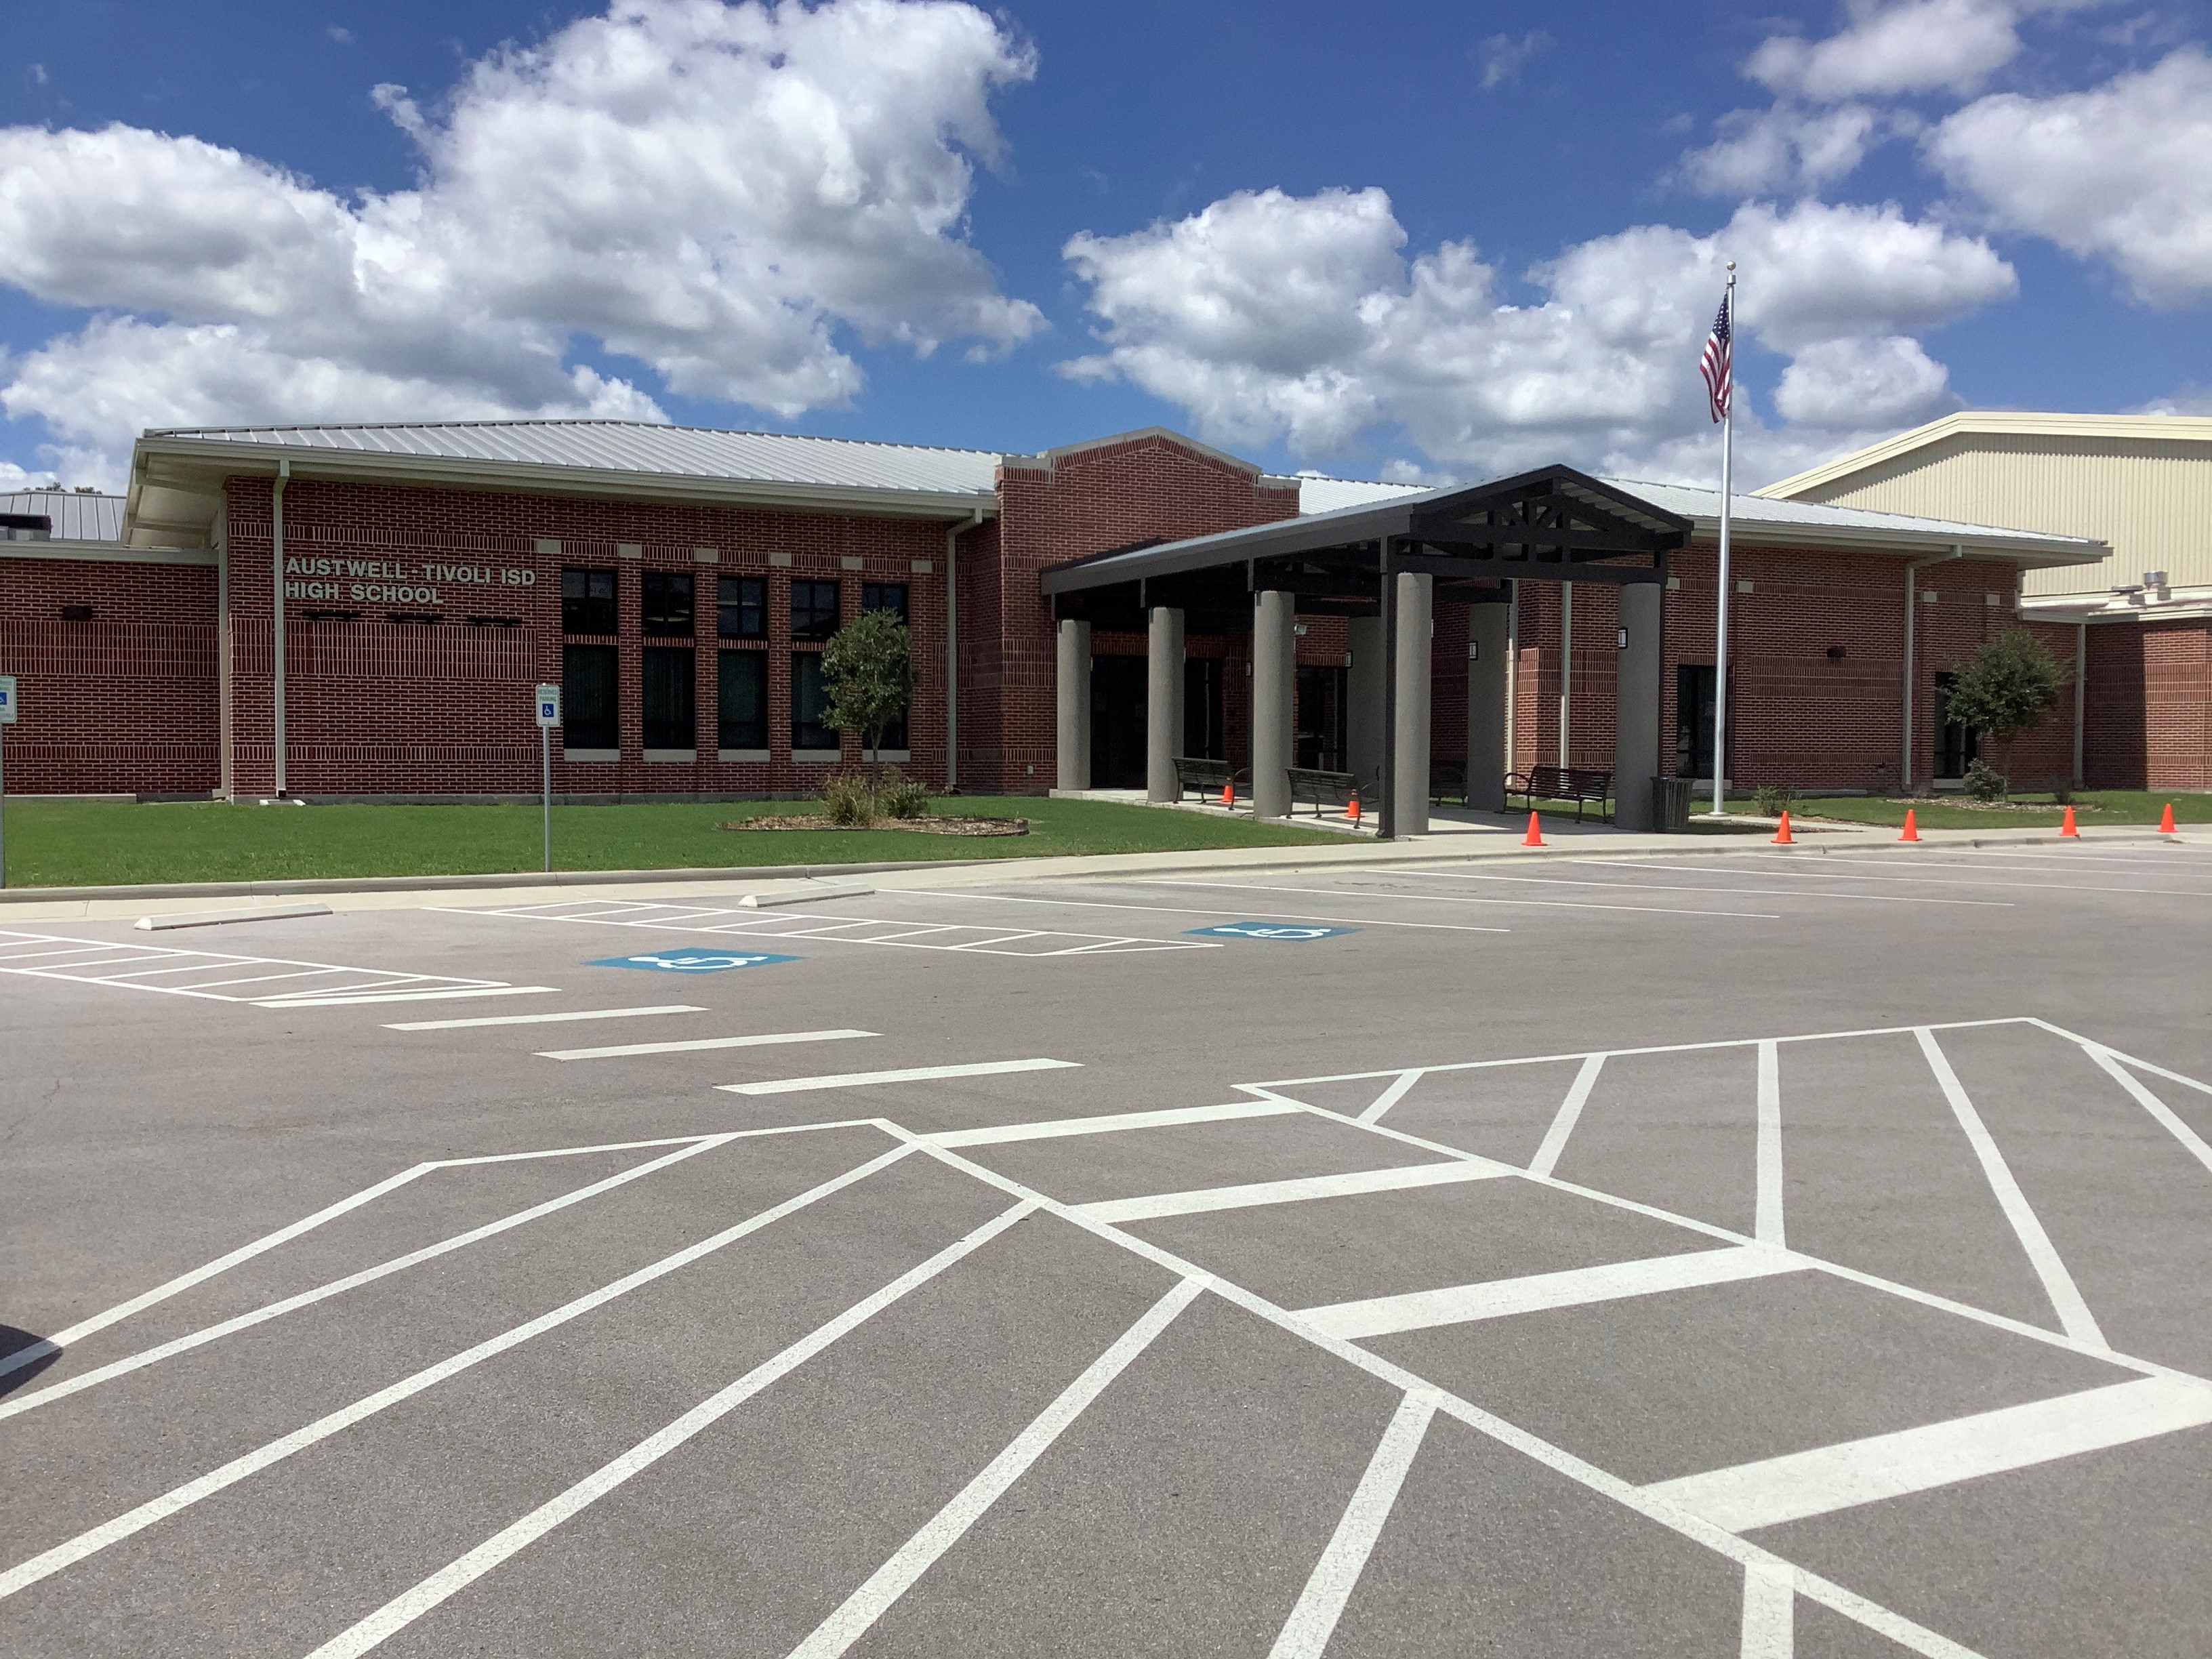 Austwell-Tivoli High School Entrance